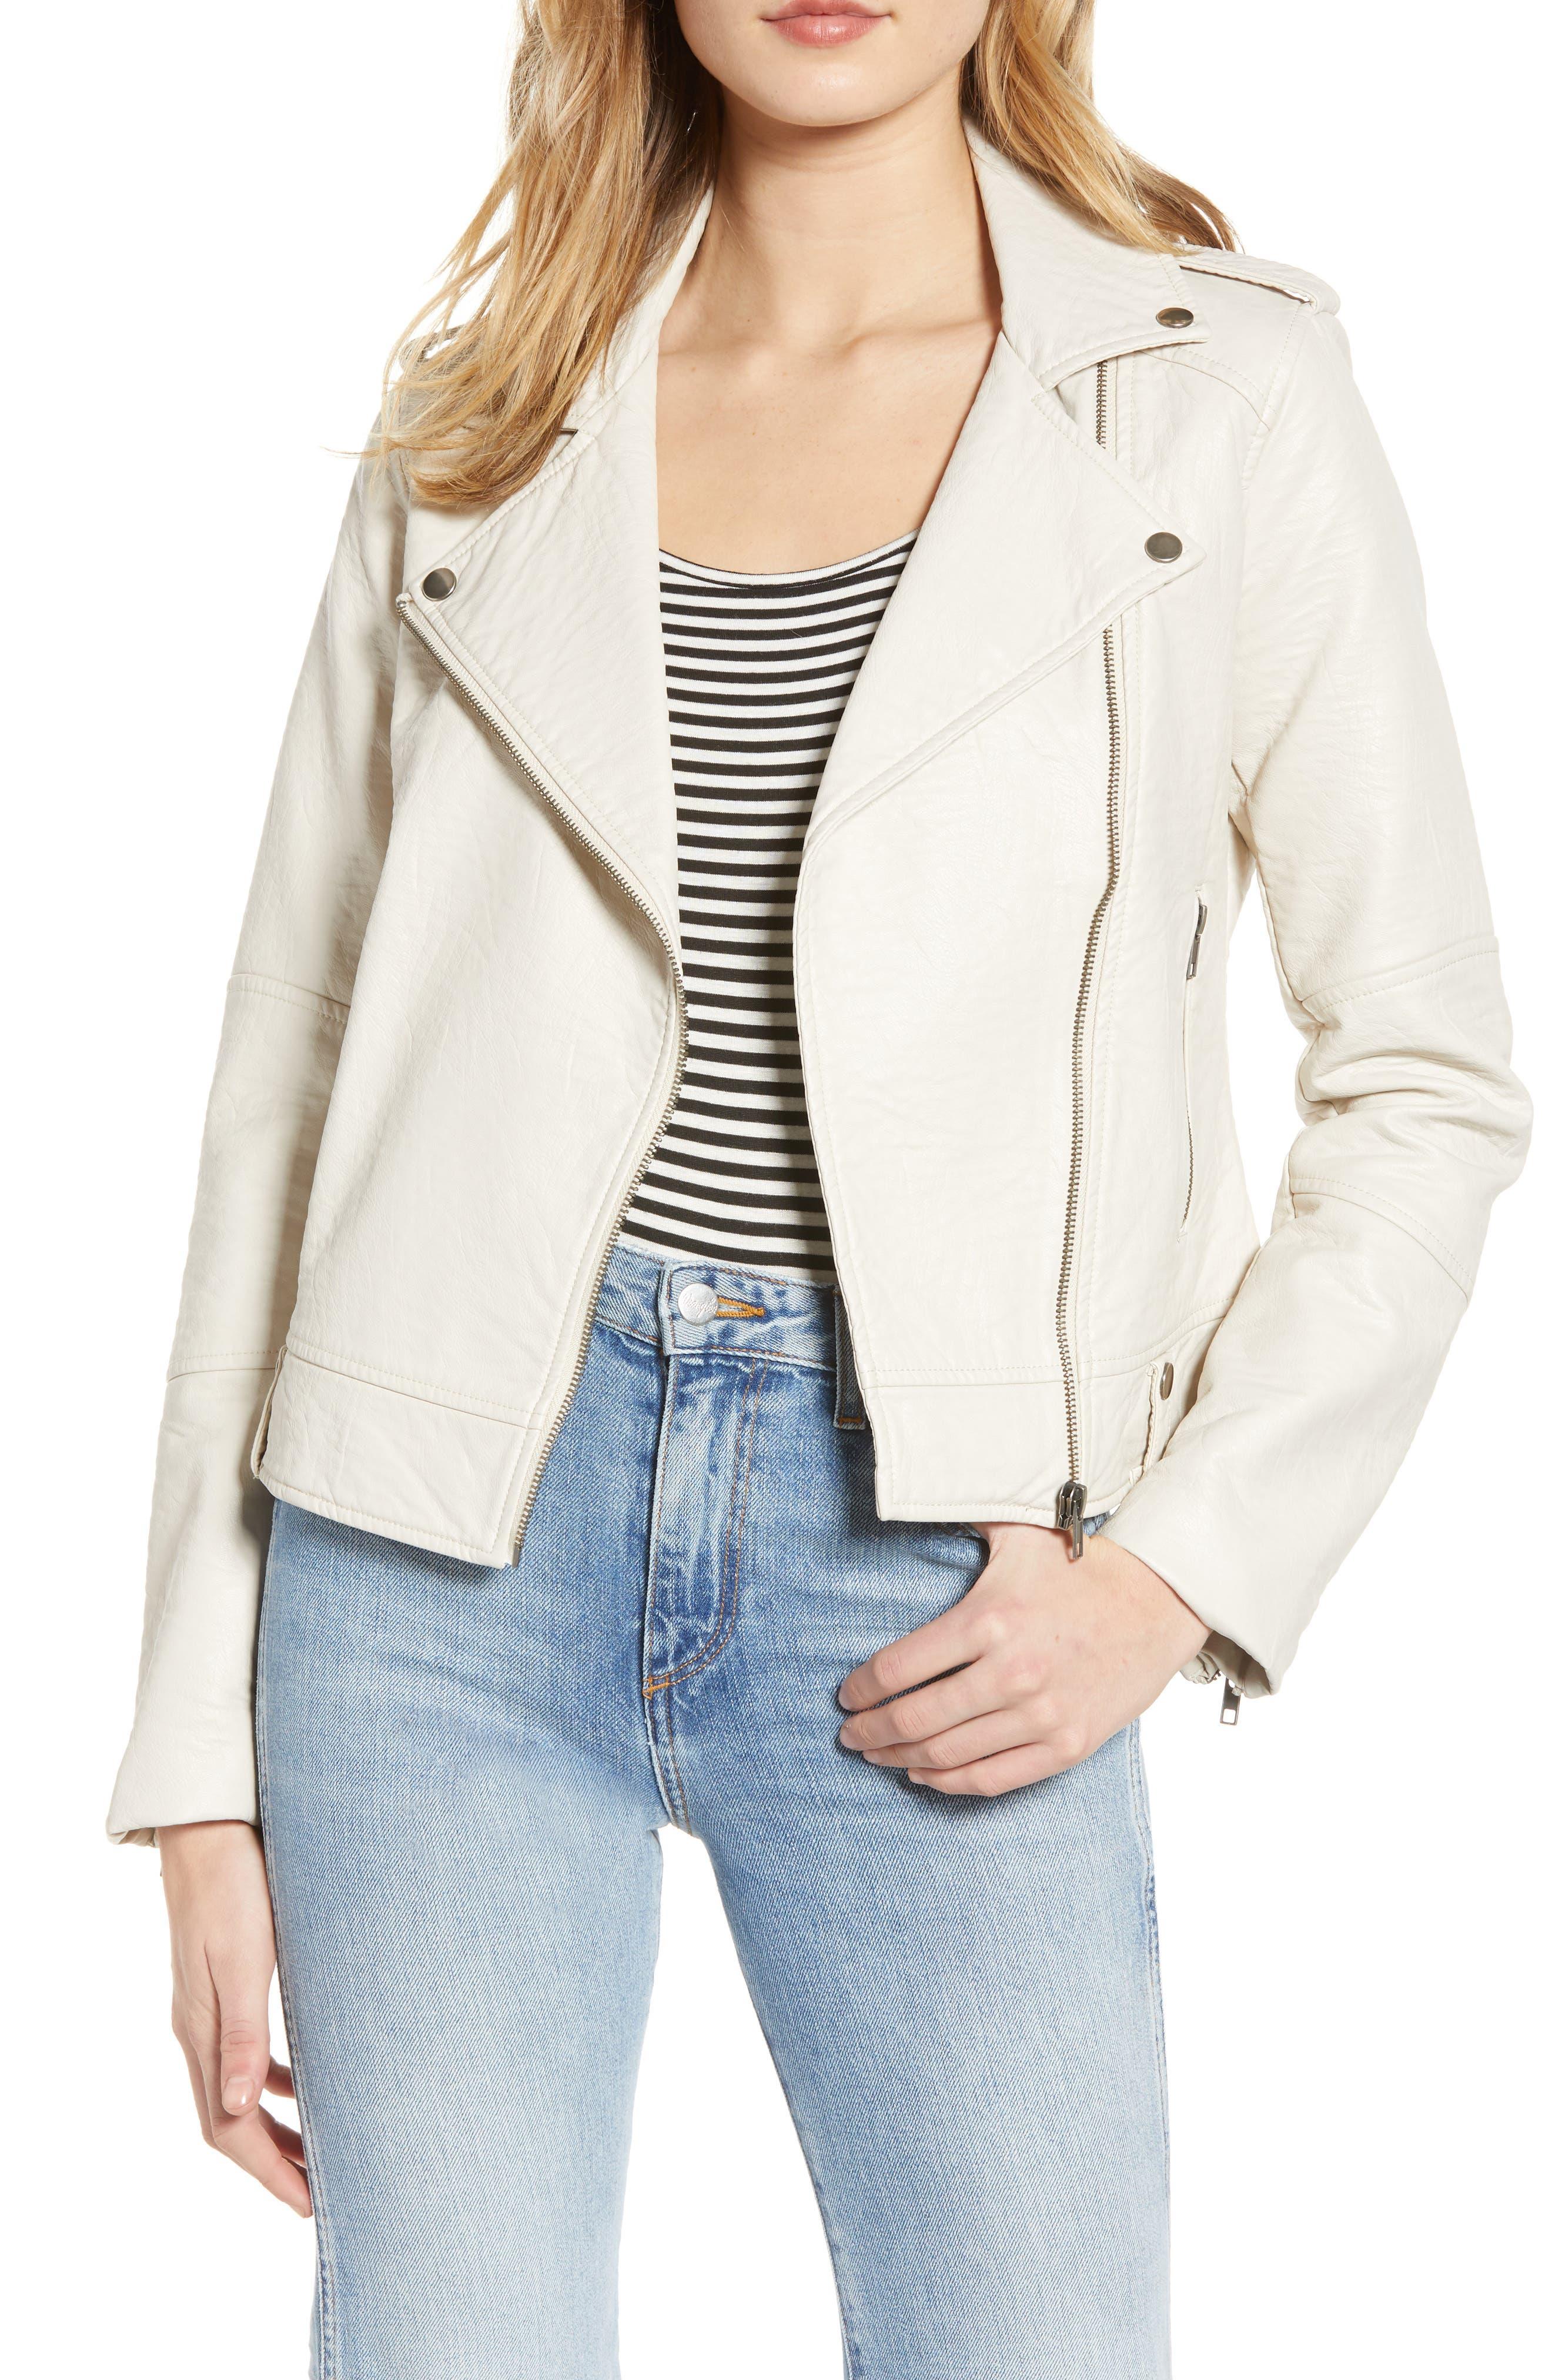 CUPCAKES AND CASHMERE, Vivica Faux Leather Jacket, Main thumbnail 1, color, BONE